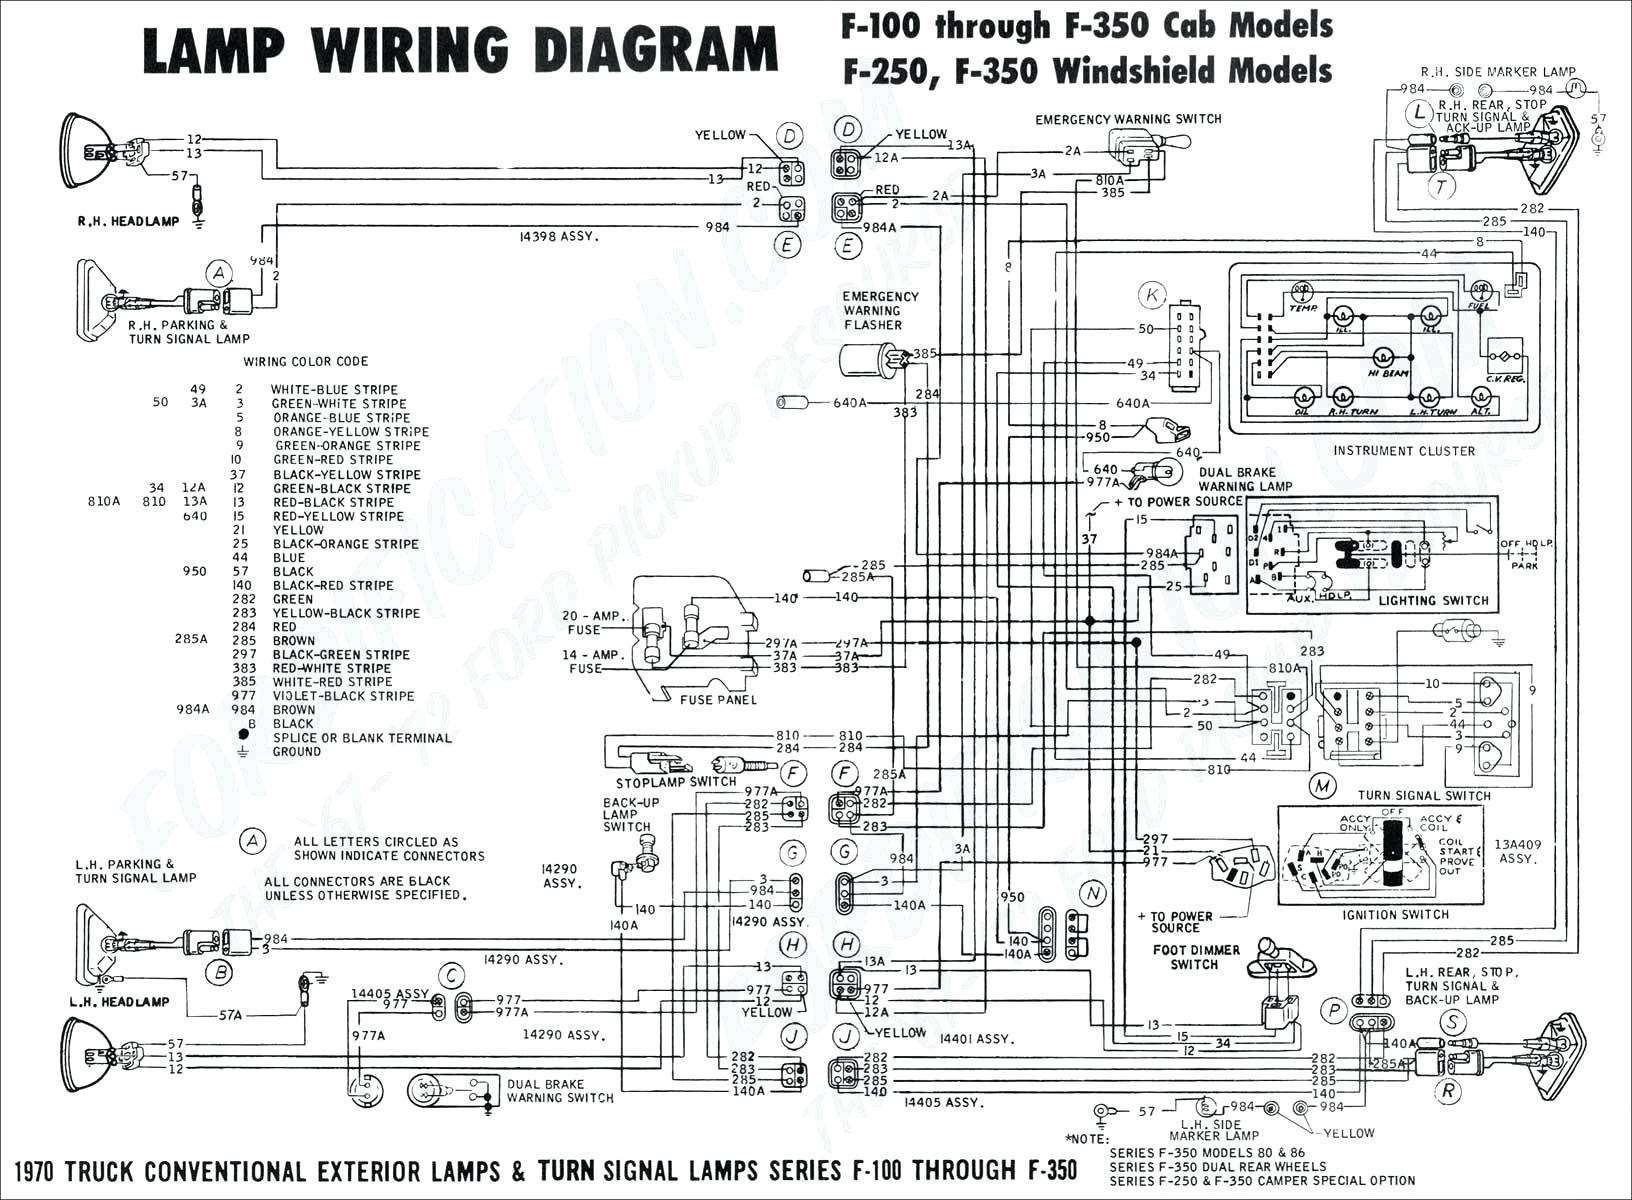 briggs stratton engine diagram kohler ignition switch wiring diagram on  tecumseh ignition diagram,